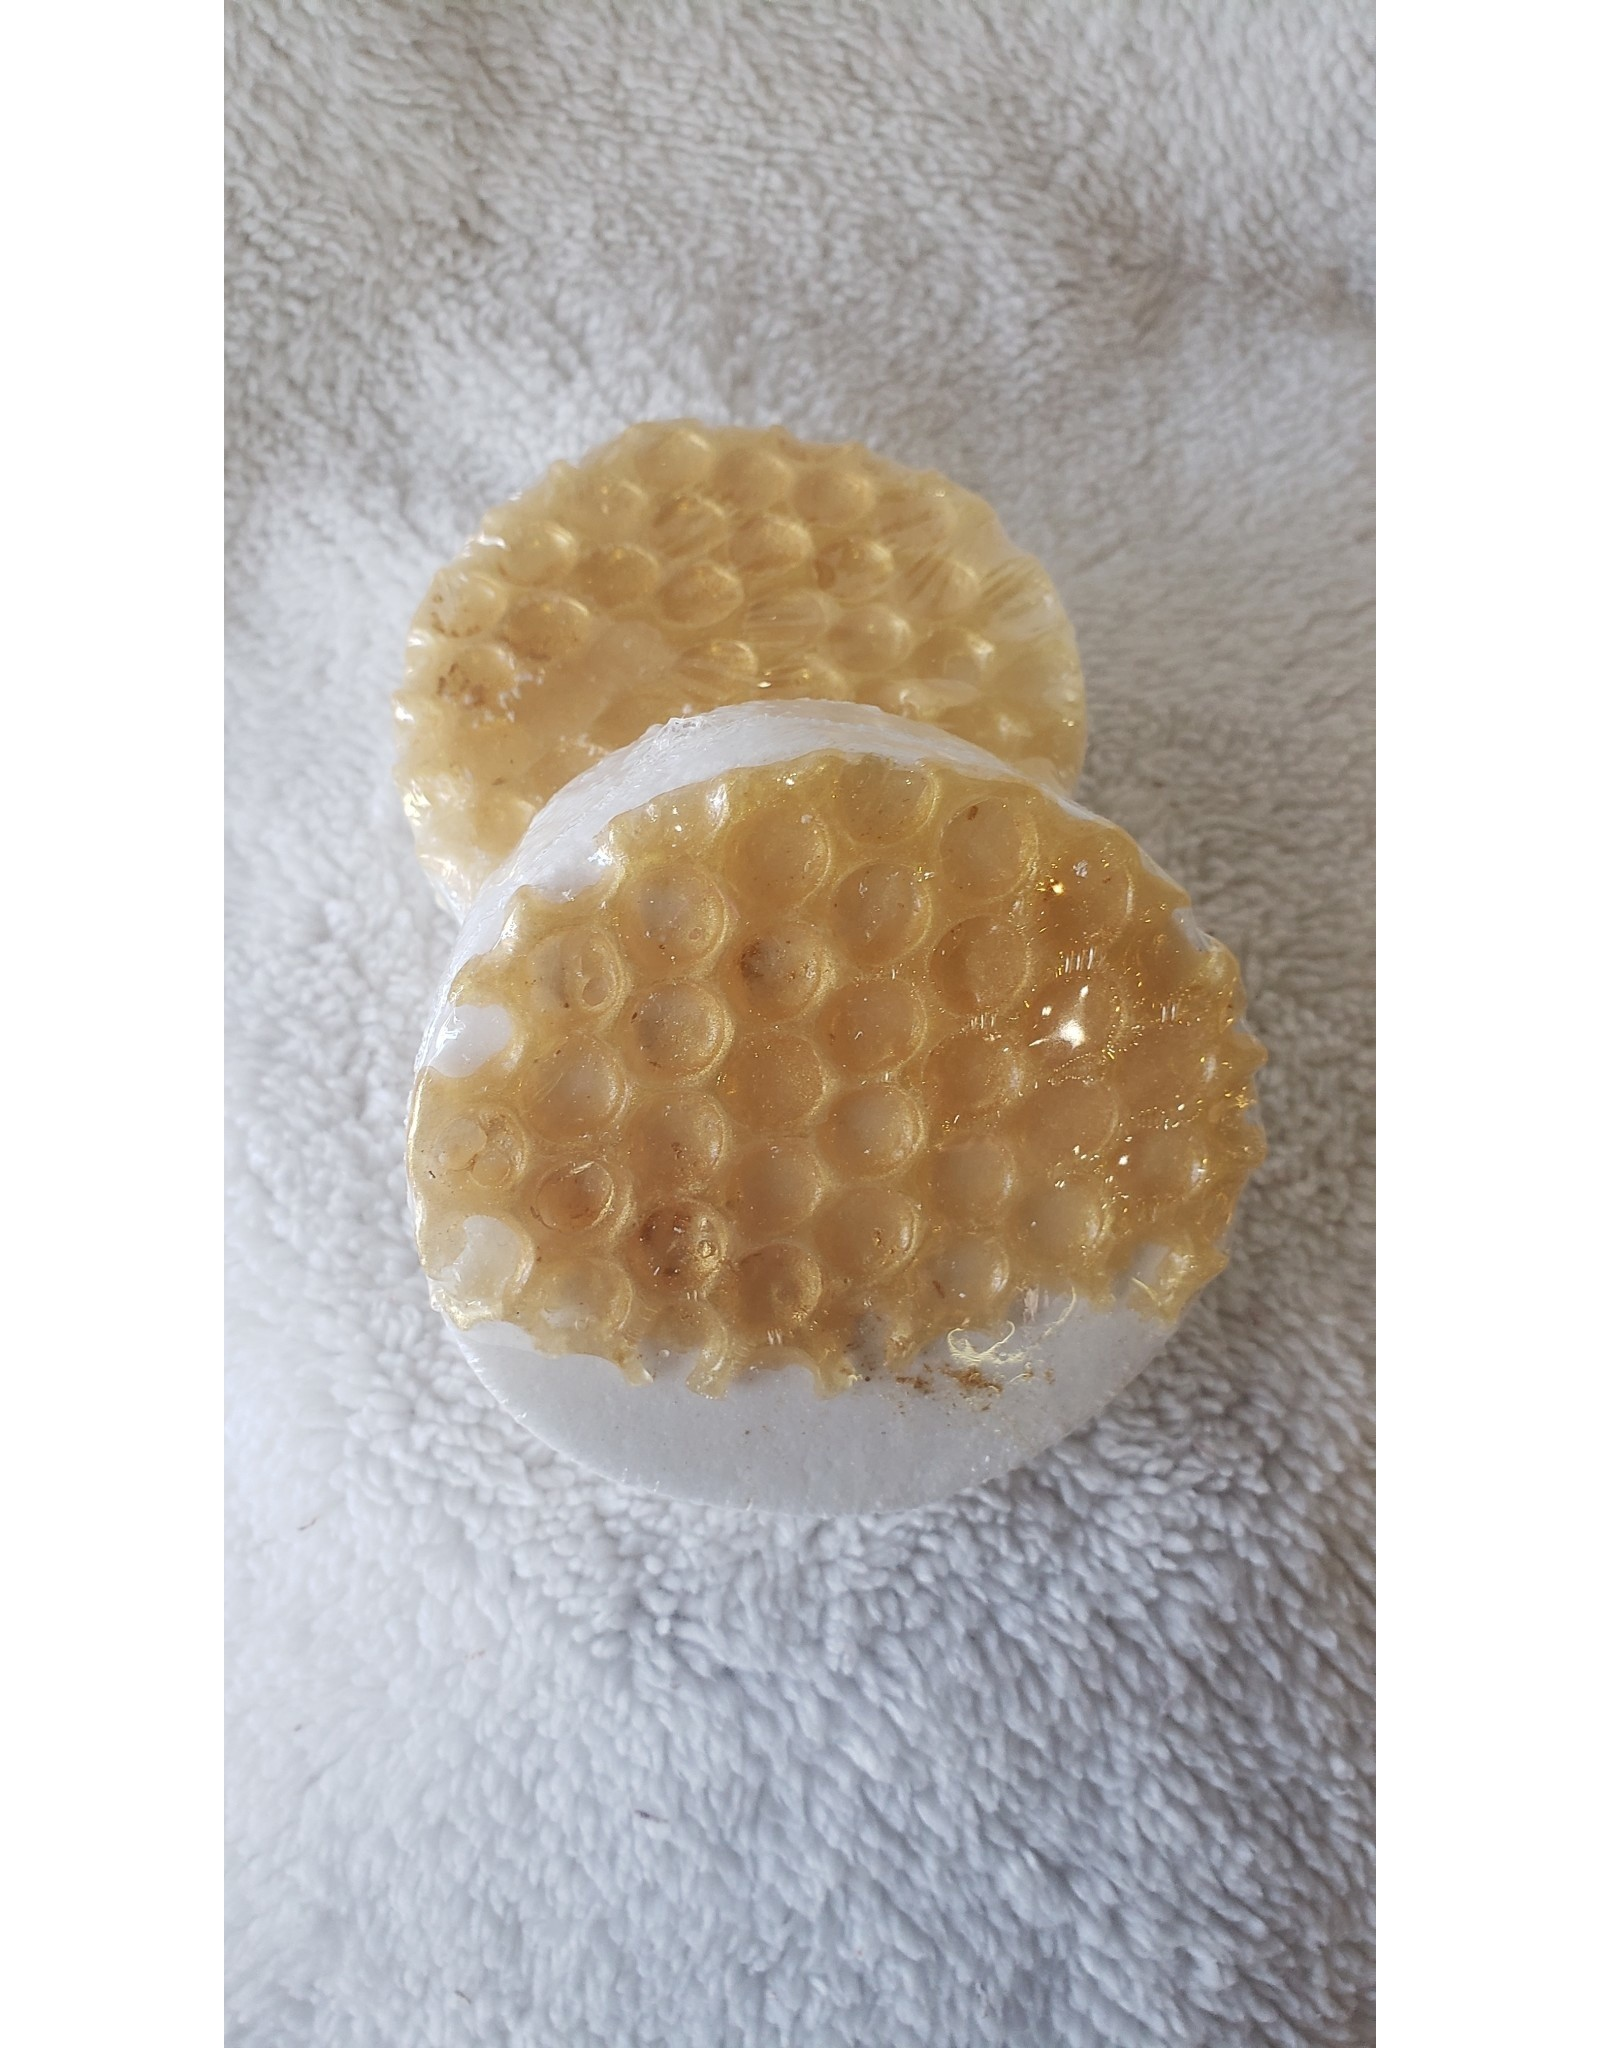 Honey Nectar Bath Bomb